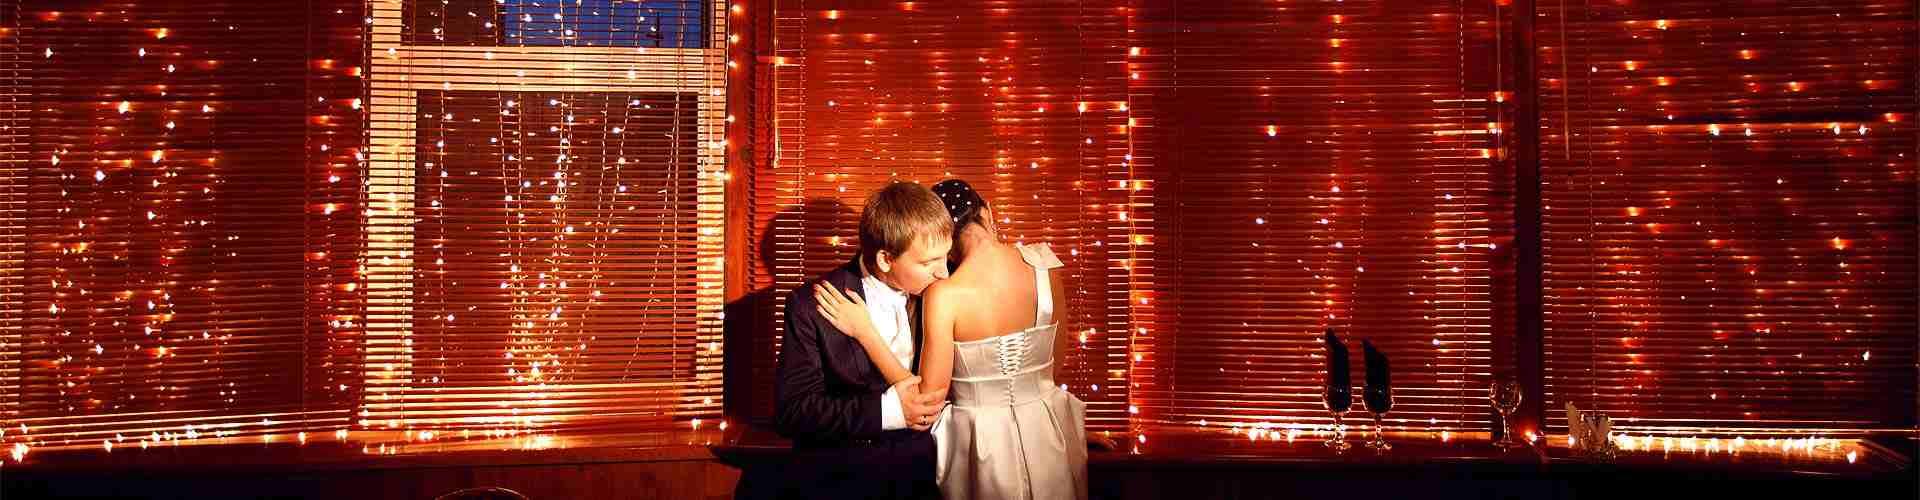 restaurantes romanticos bodas en restaurantes de La Romana